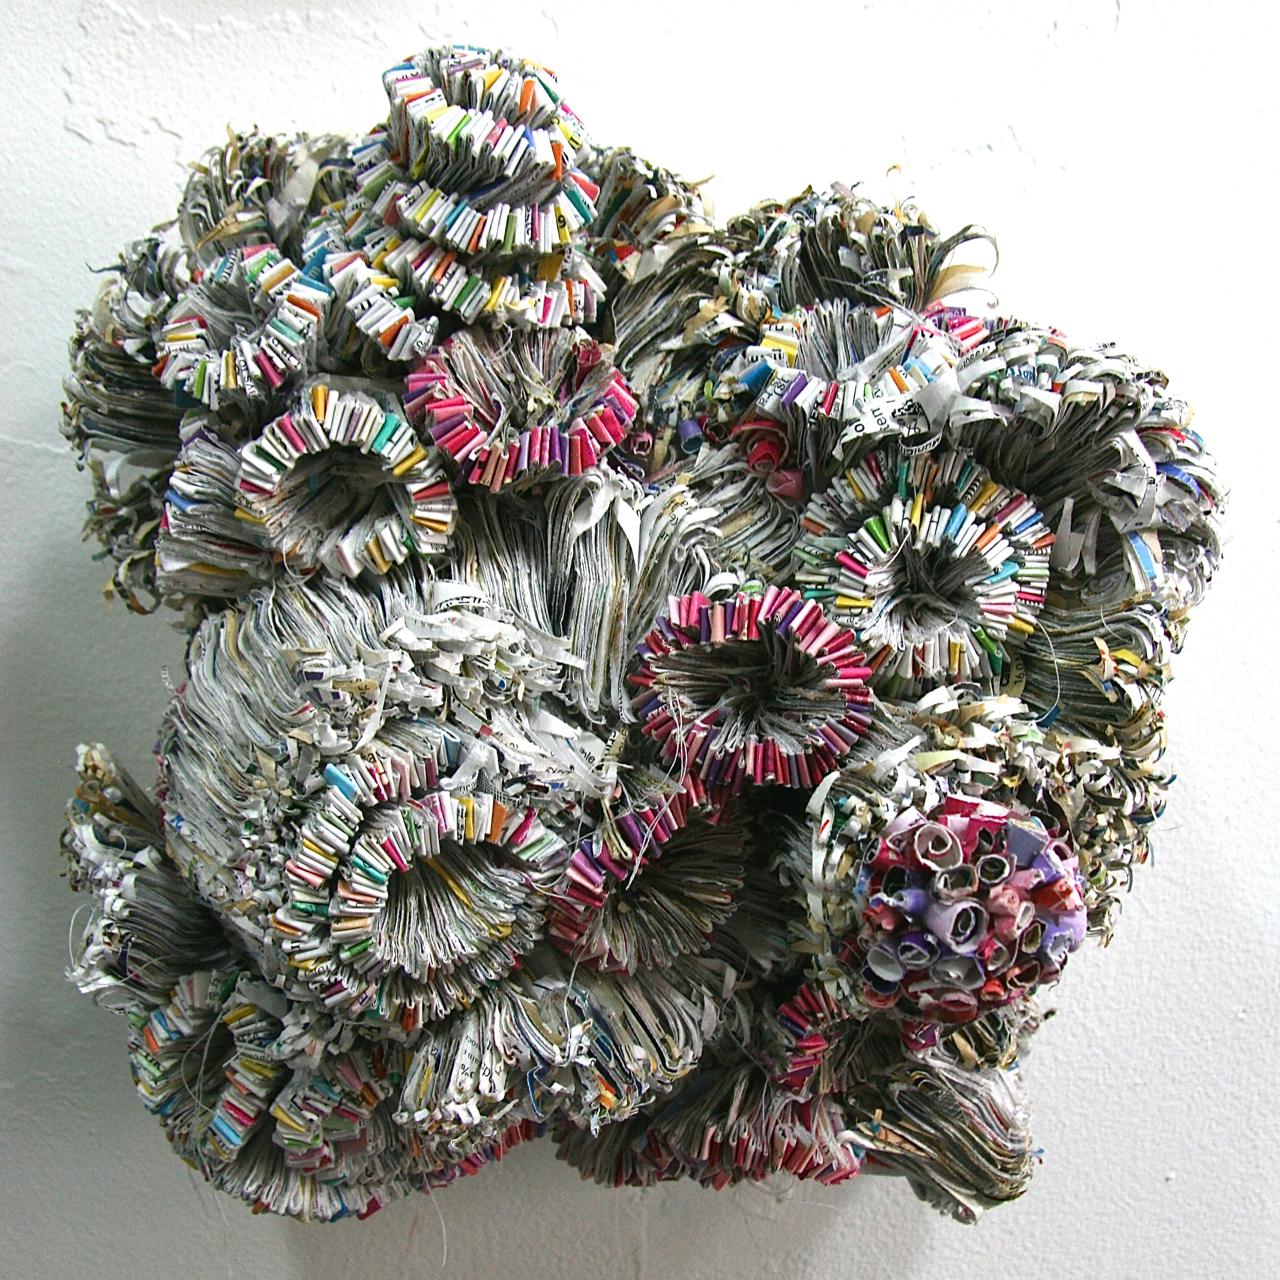 Jaynie Crimmins_paper sculpture_junk mail